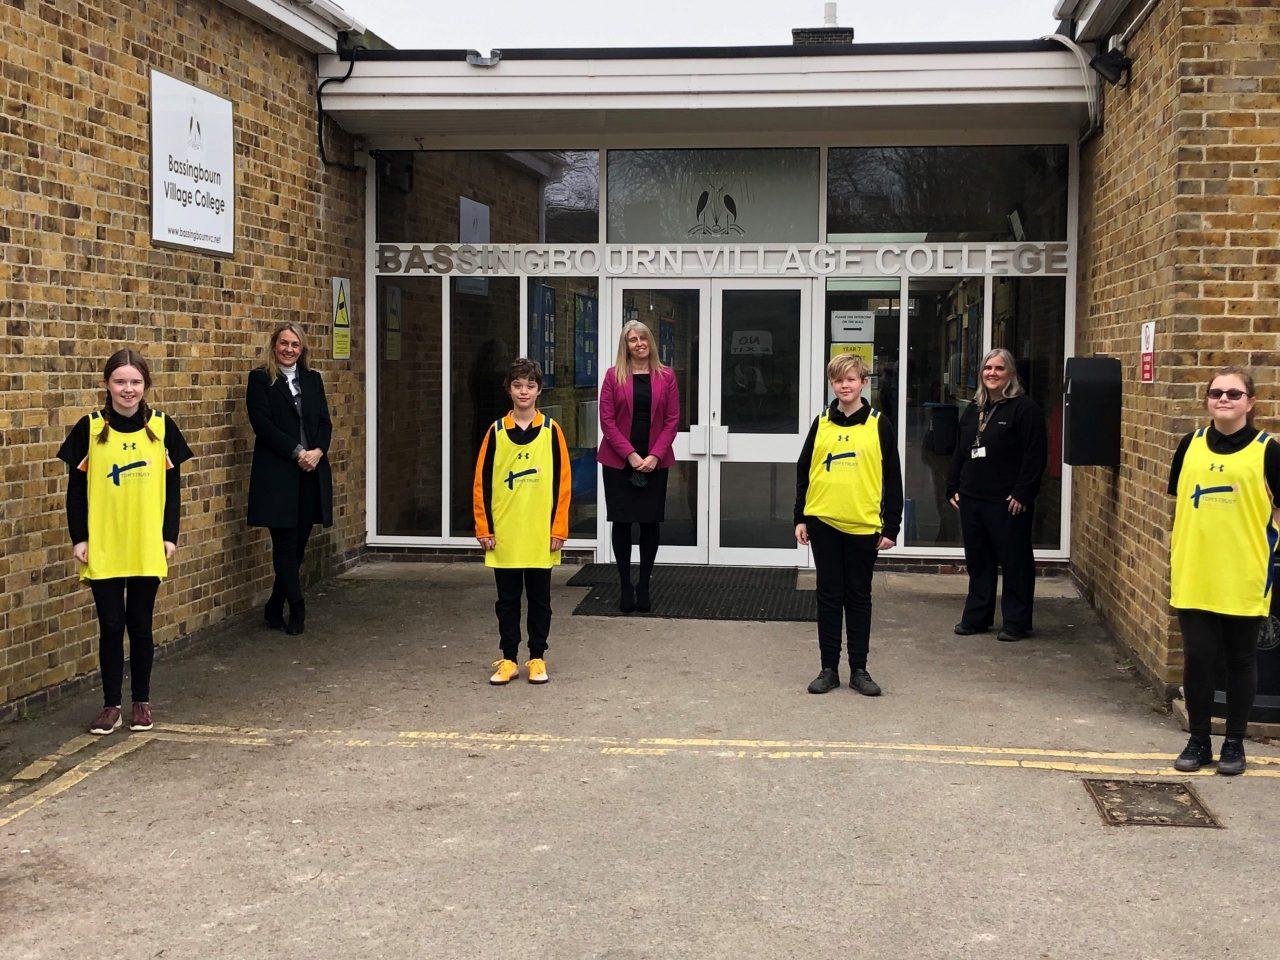 Schoolchildren raise more than £4,000 for children's brain tumour charity